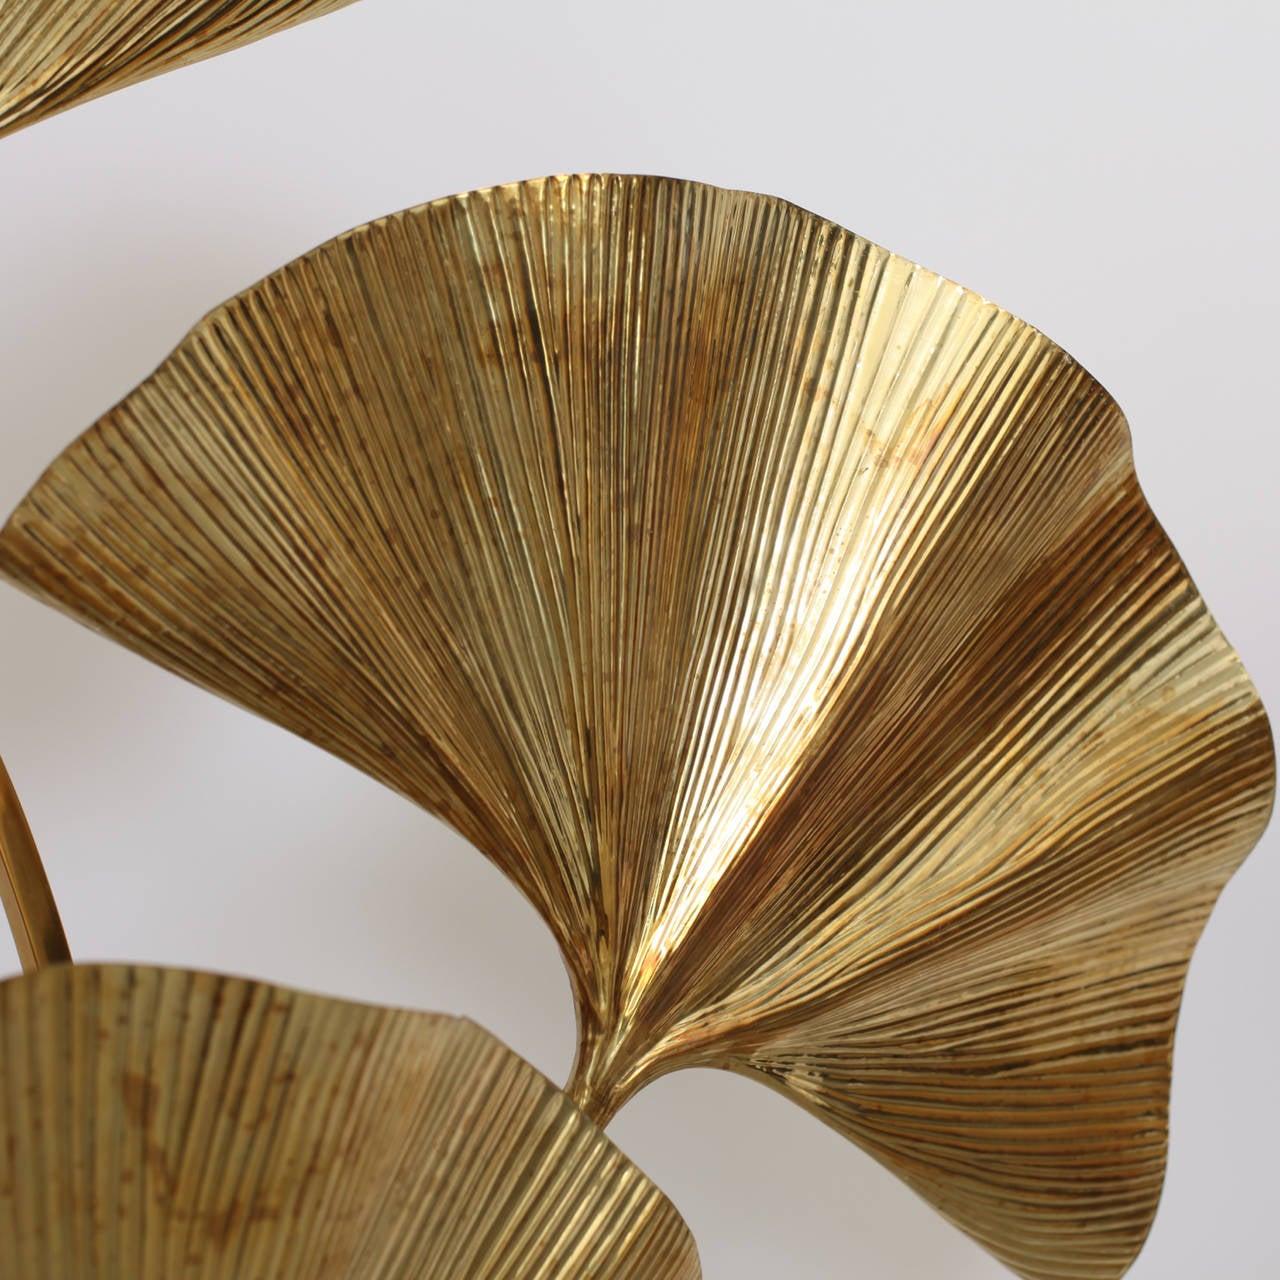 Huge Four Ginkgo Leaf Brass Floor Lamp by Tommaso Barbi 1